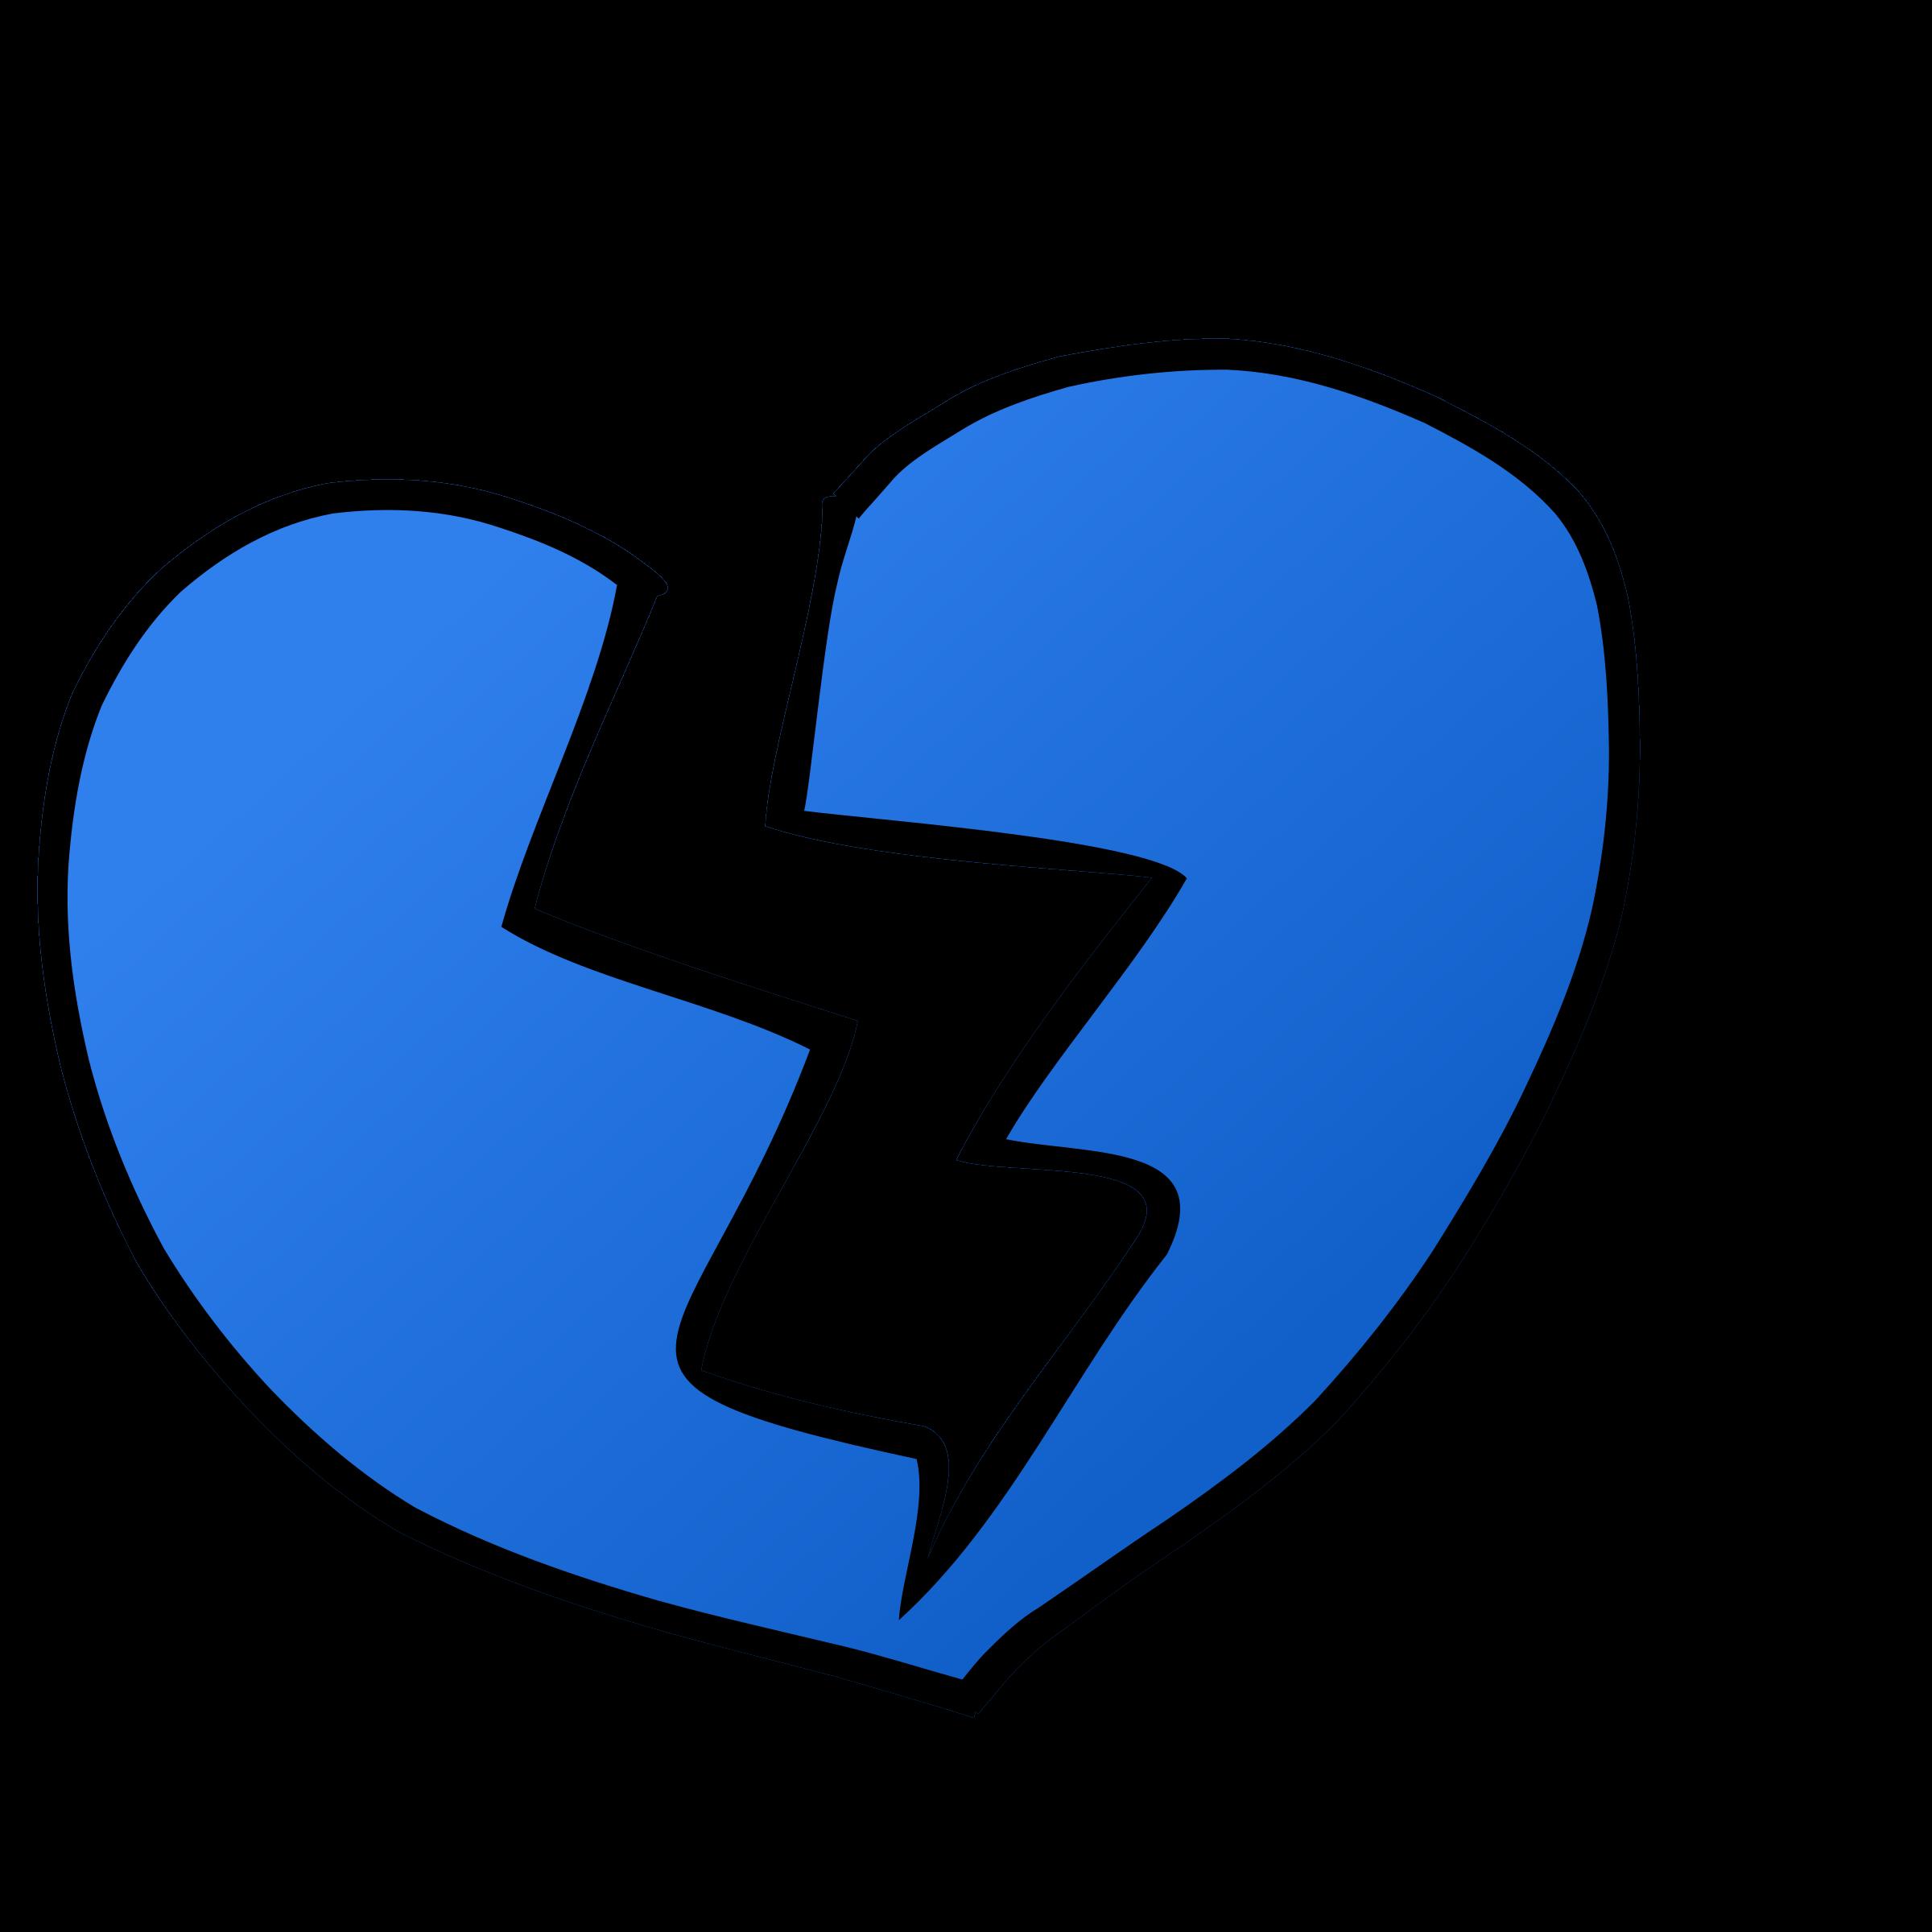 transparent Heart cilpart majestic design. Broken clipart intact